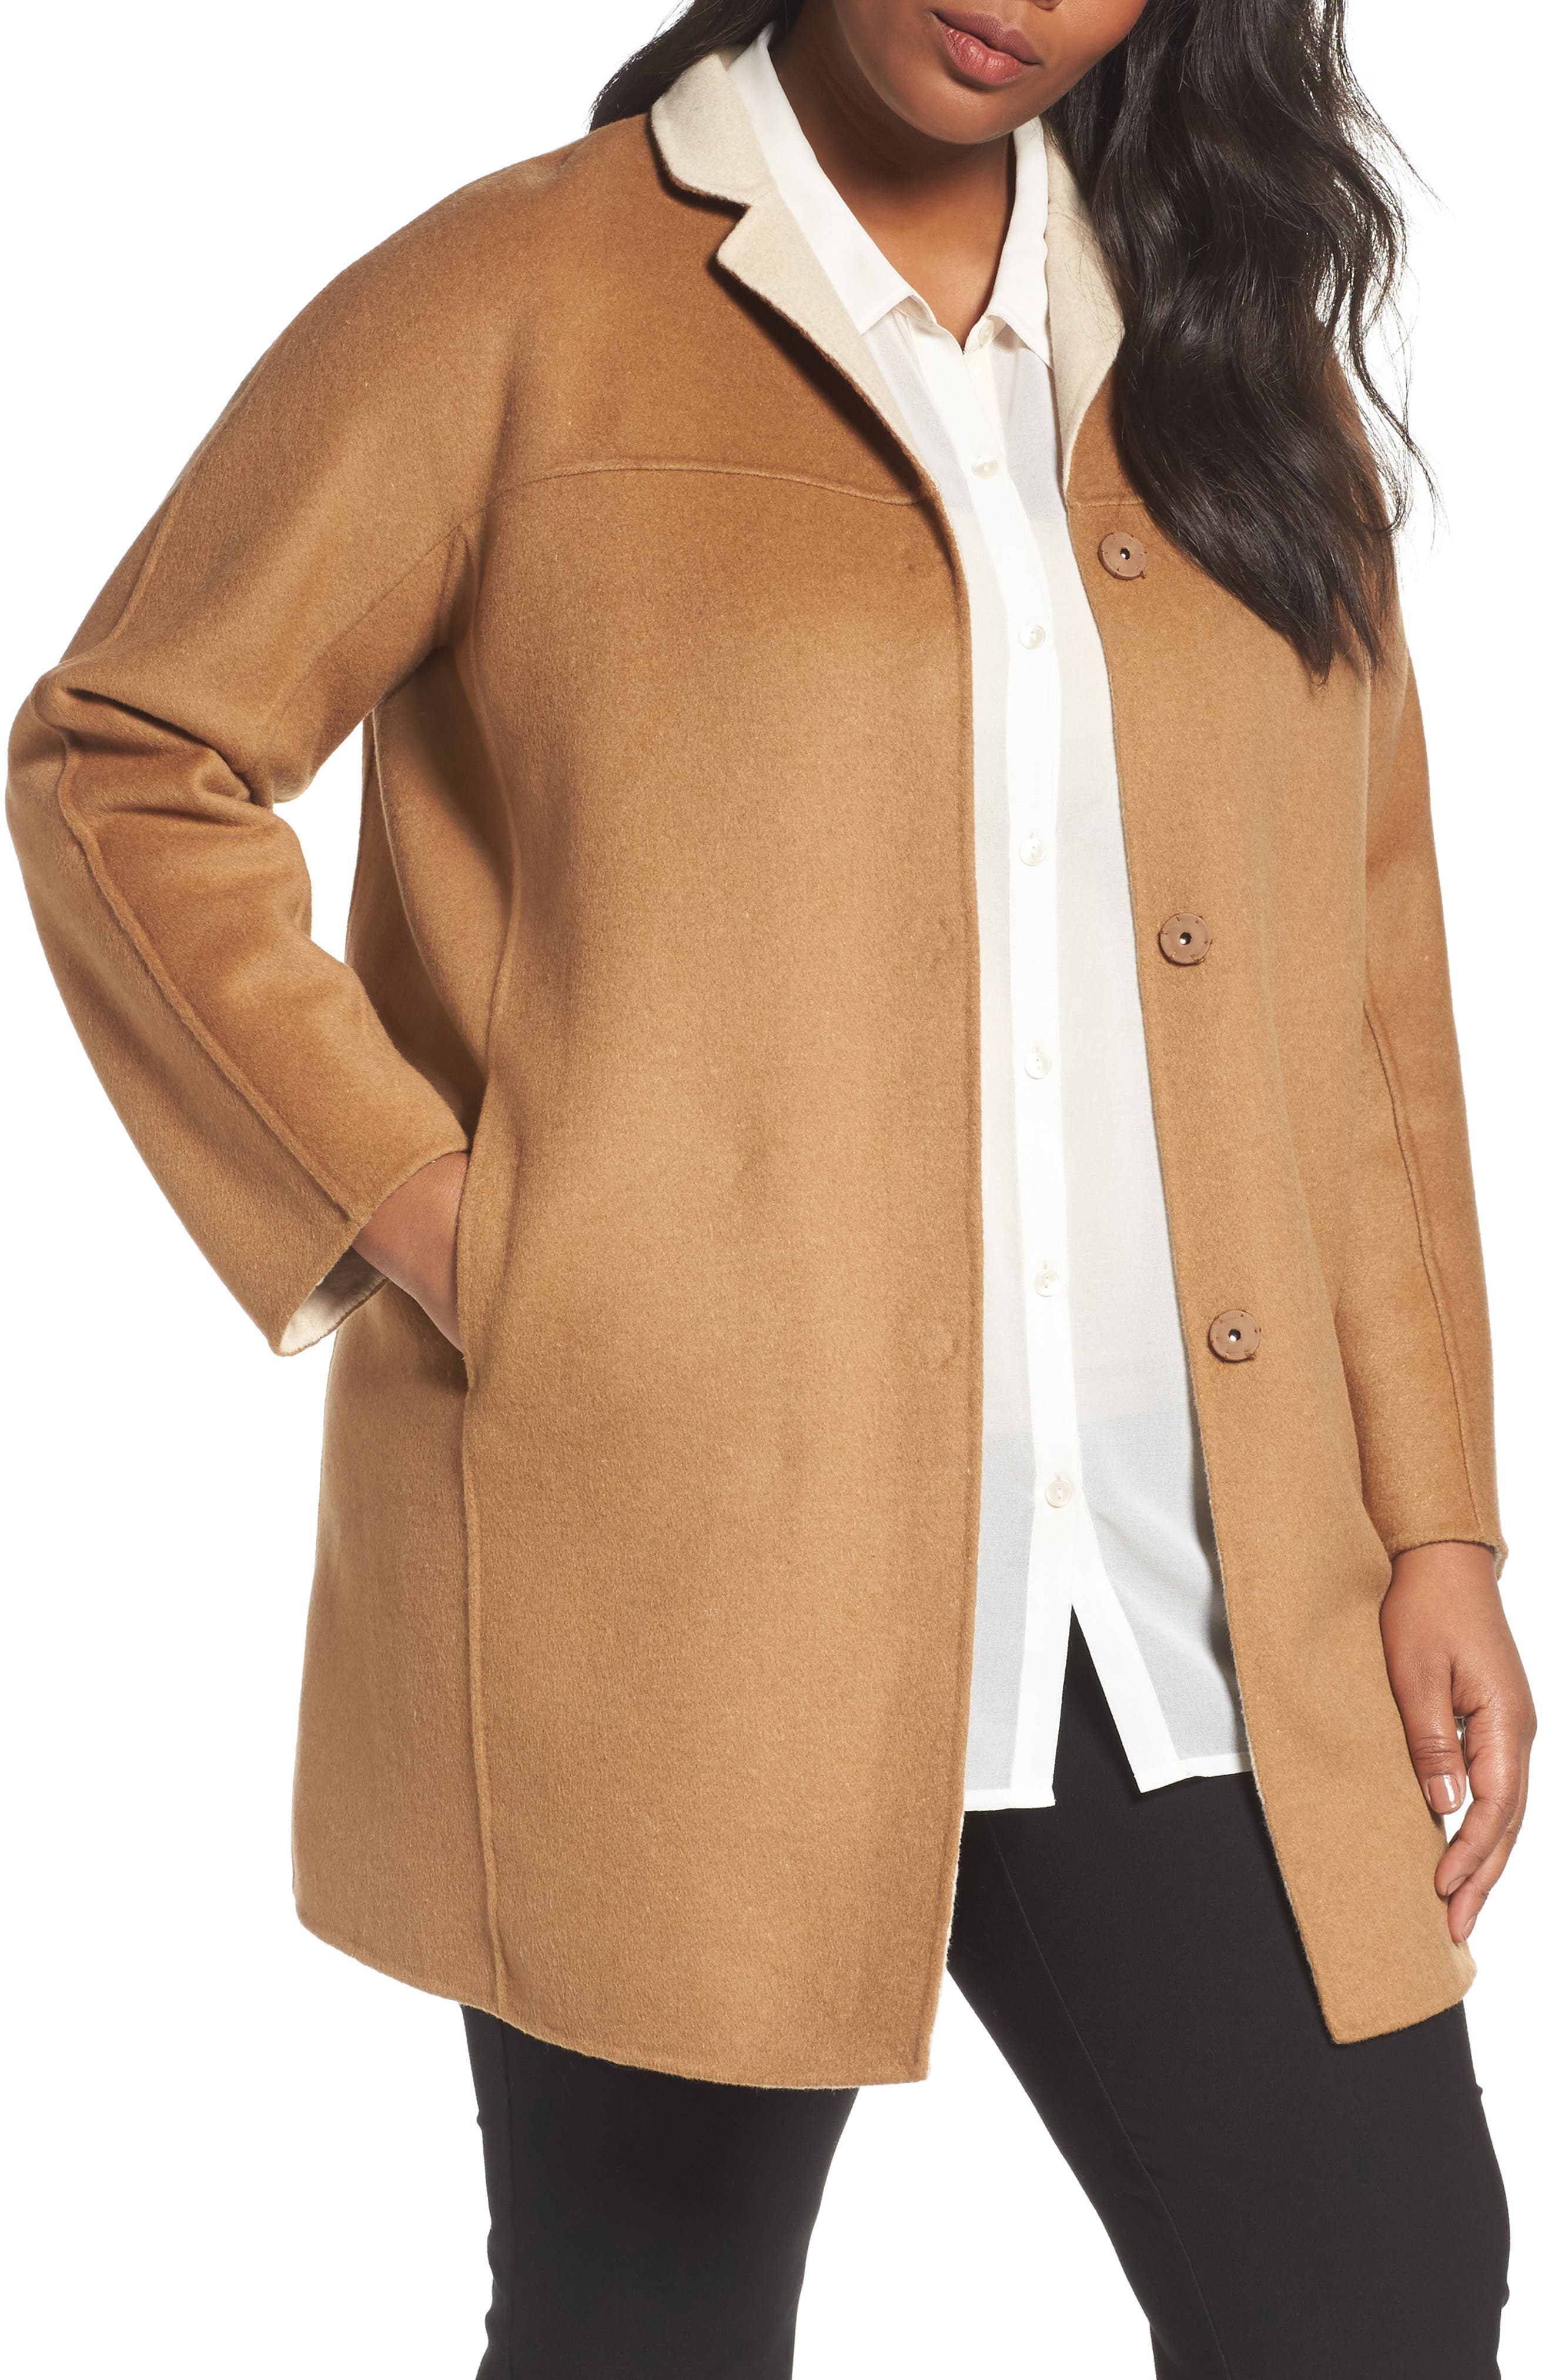 Nina Double Face Wool Blend Coat,                             Main thumbnail 1, color,                             214